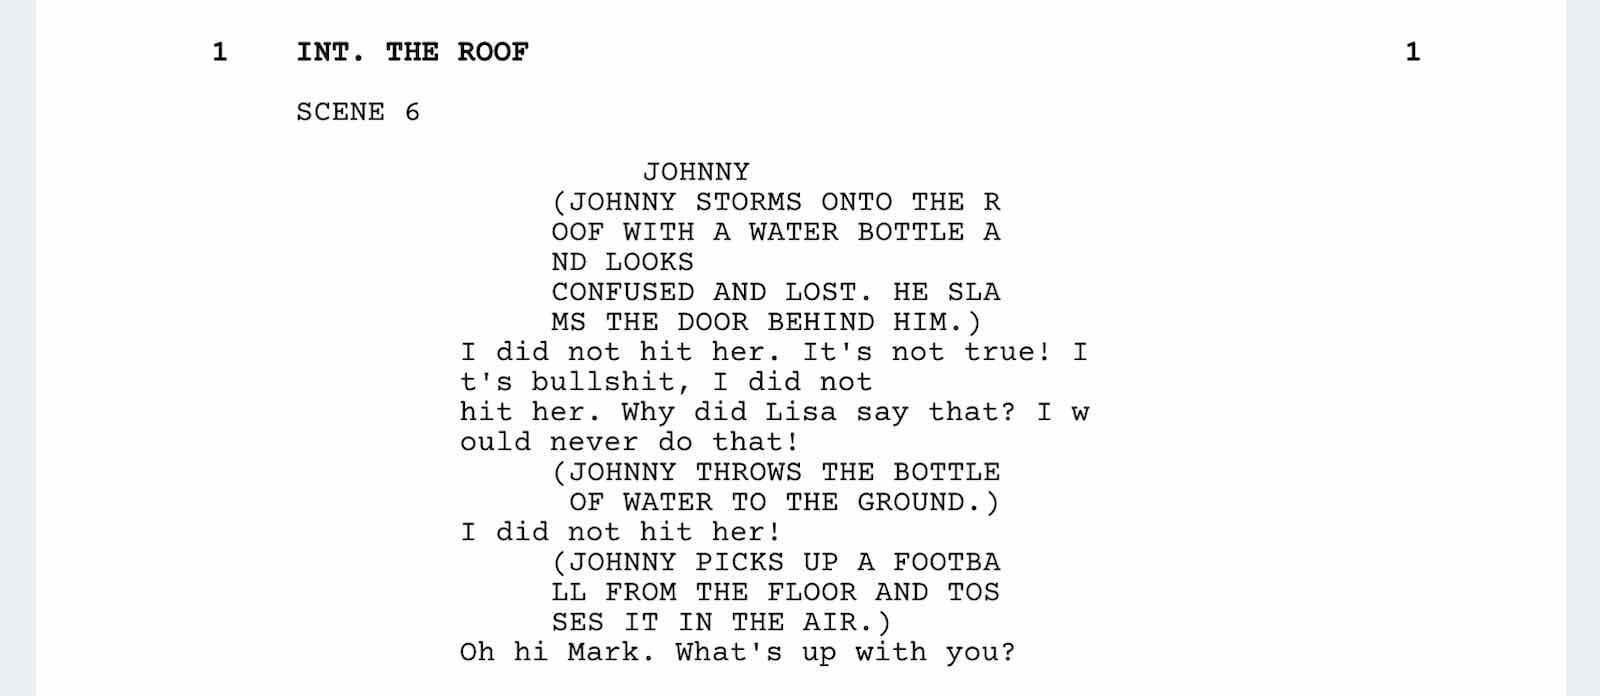 The Room Script Teardown - Roof Scene - StudioBinder